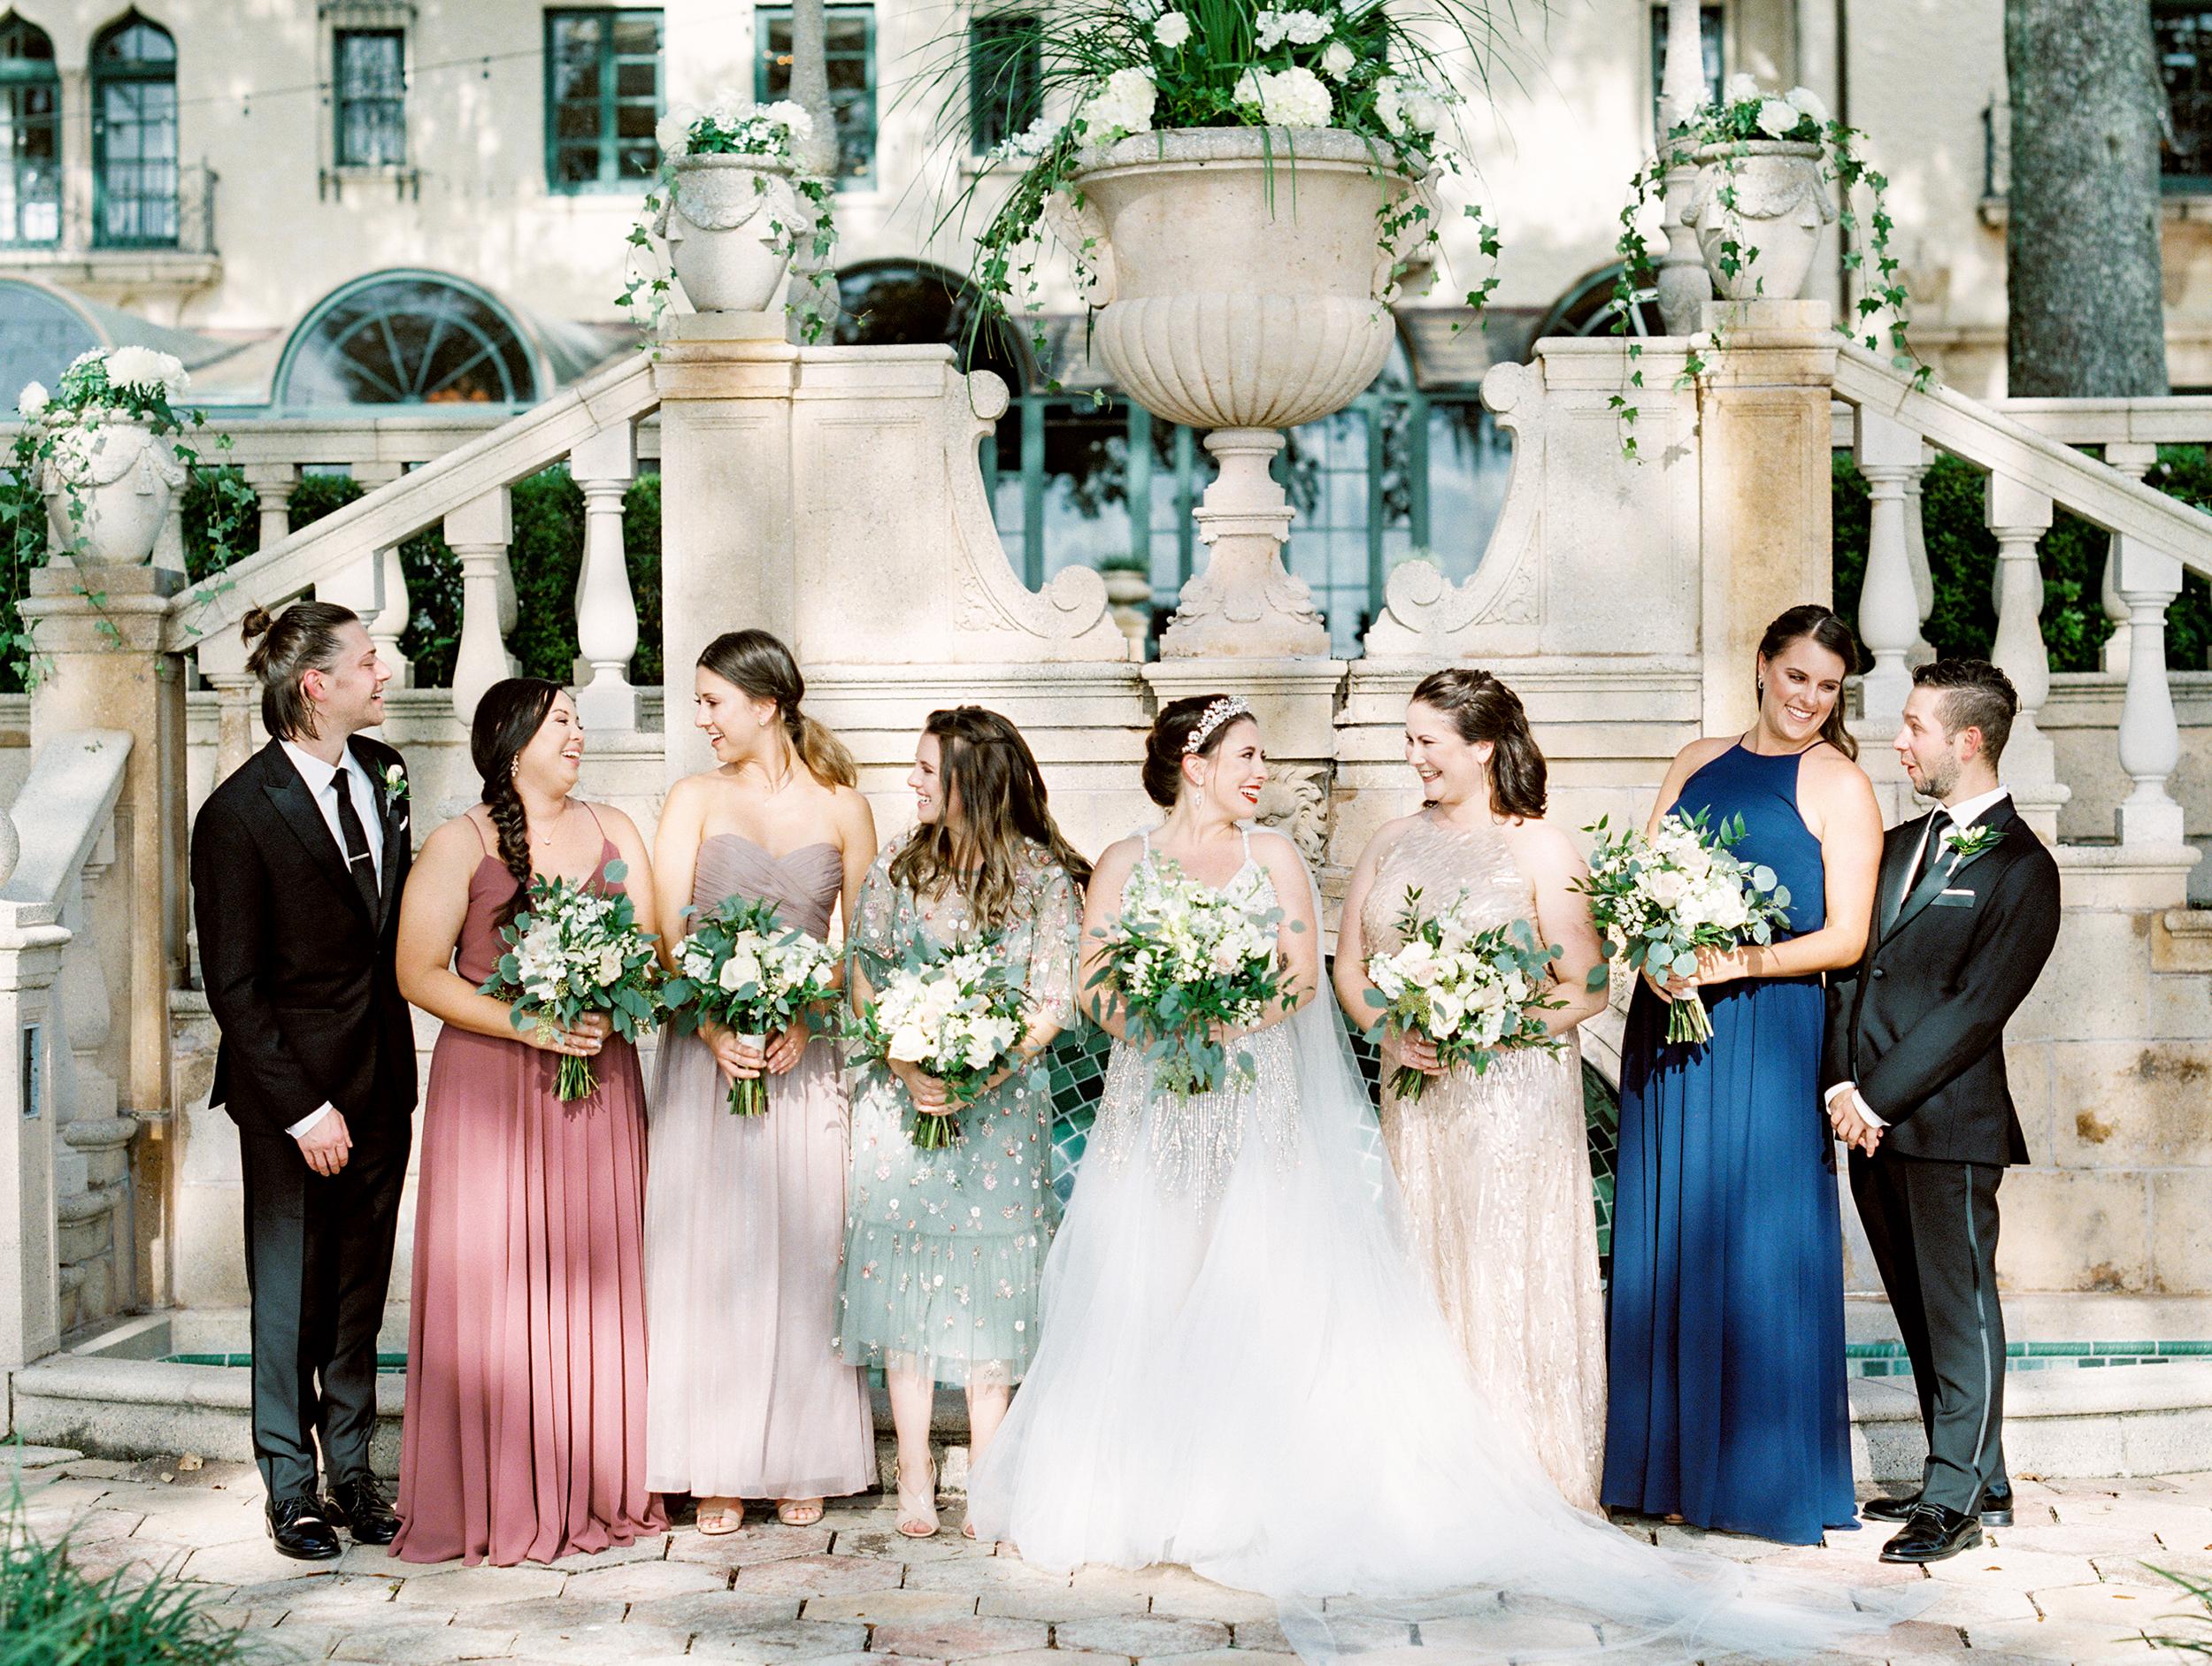 Lisa Silva Photography- Jacksonville, Florida Fine Art Film Wedding Photography Epping Forrest Yacht Club 14.jpg